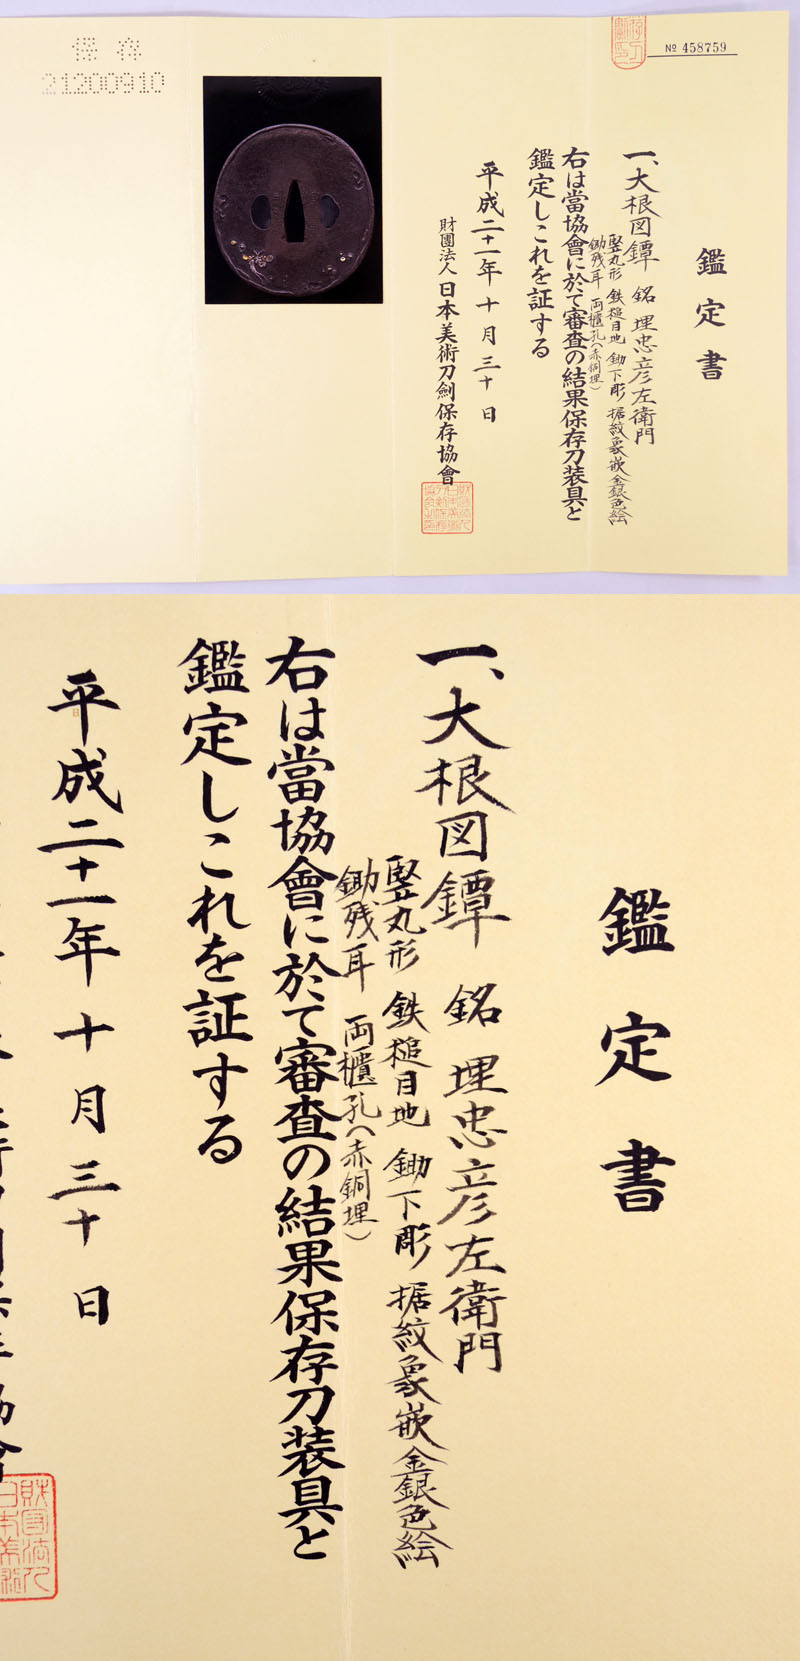 大根図鍔 銘 埋忠彦左衛門 Picture of Certificate